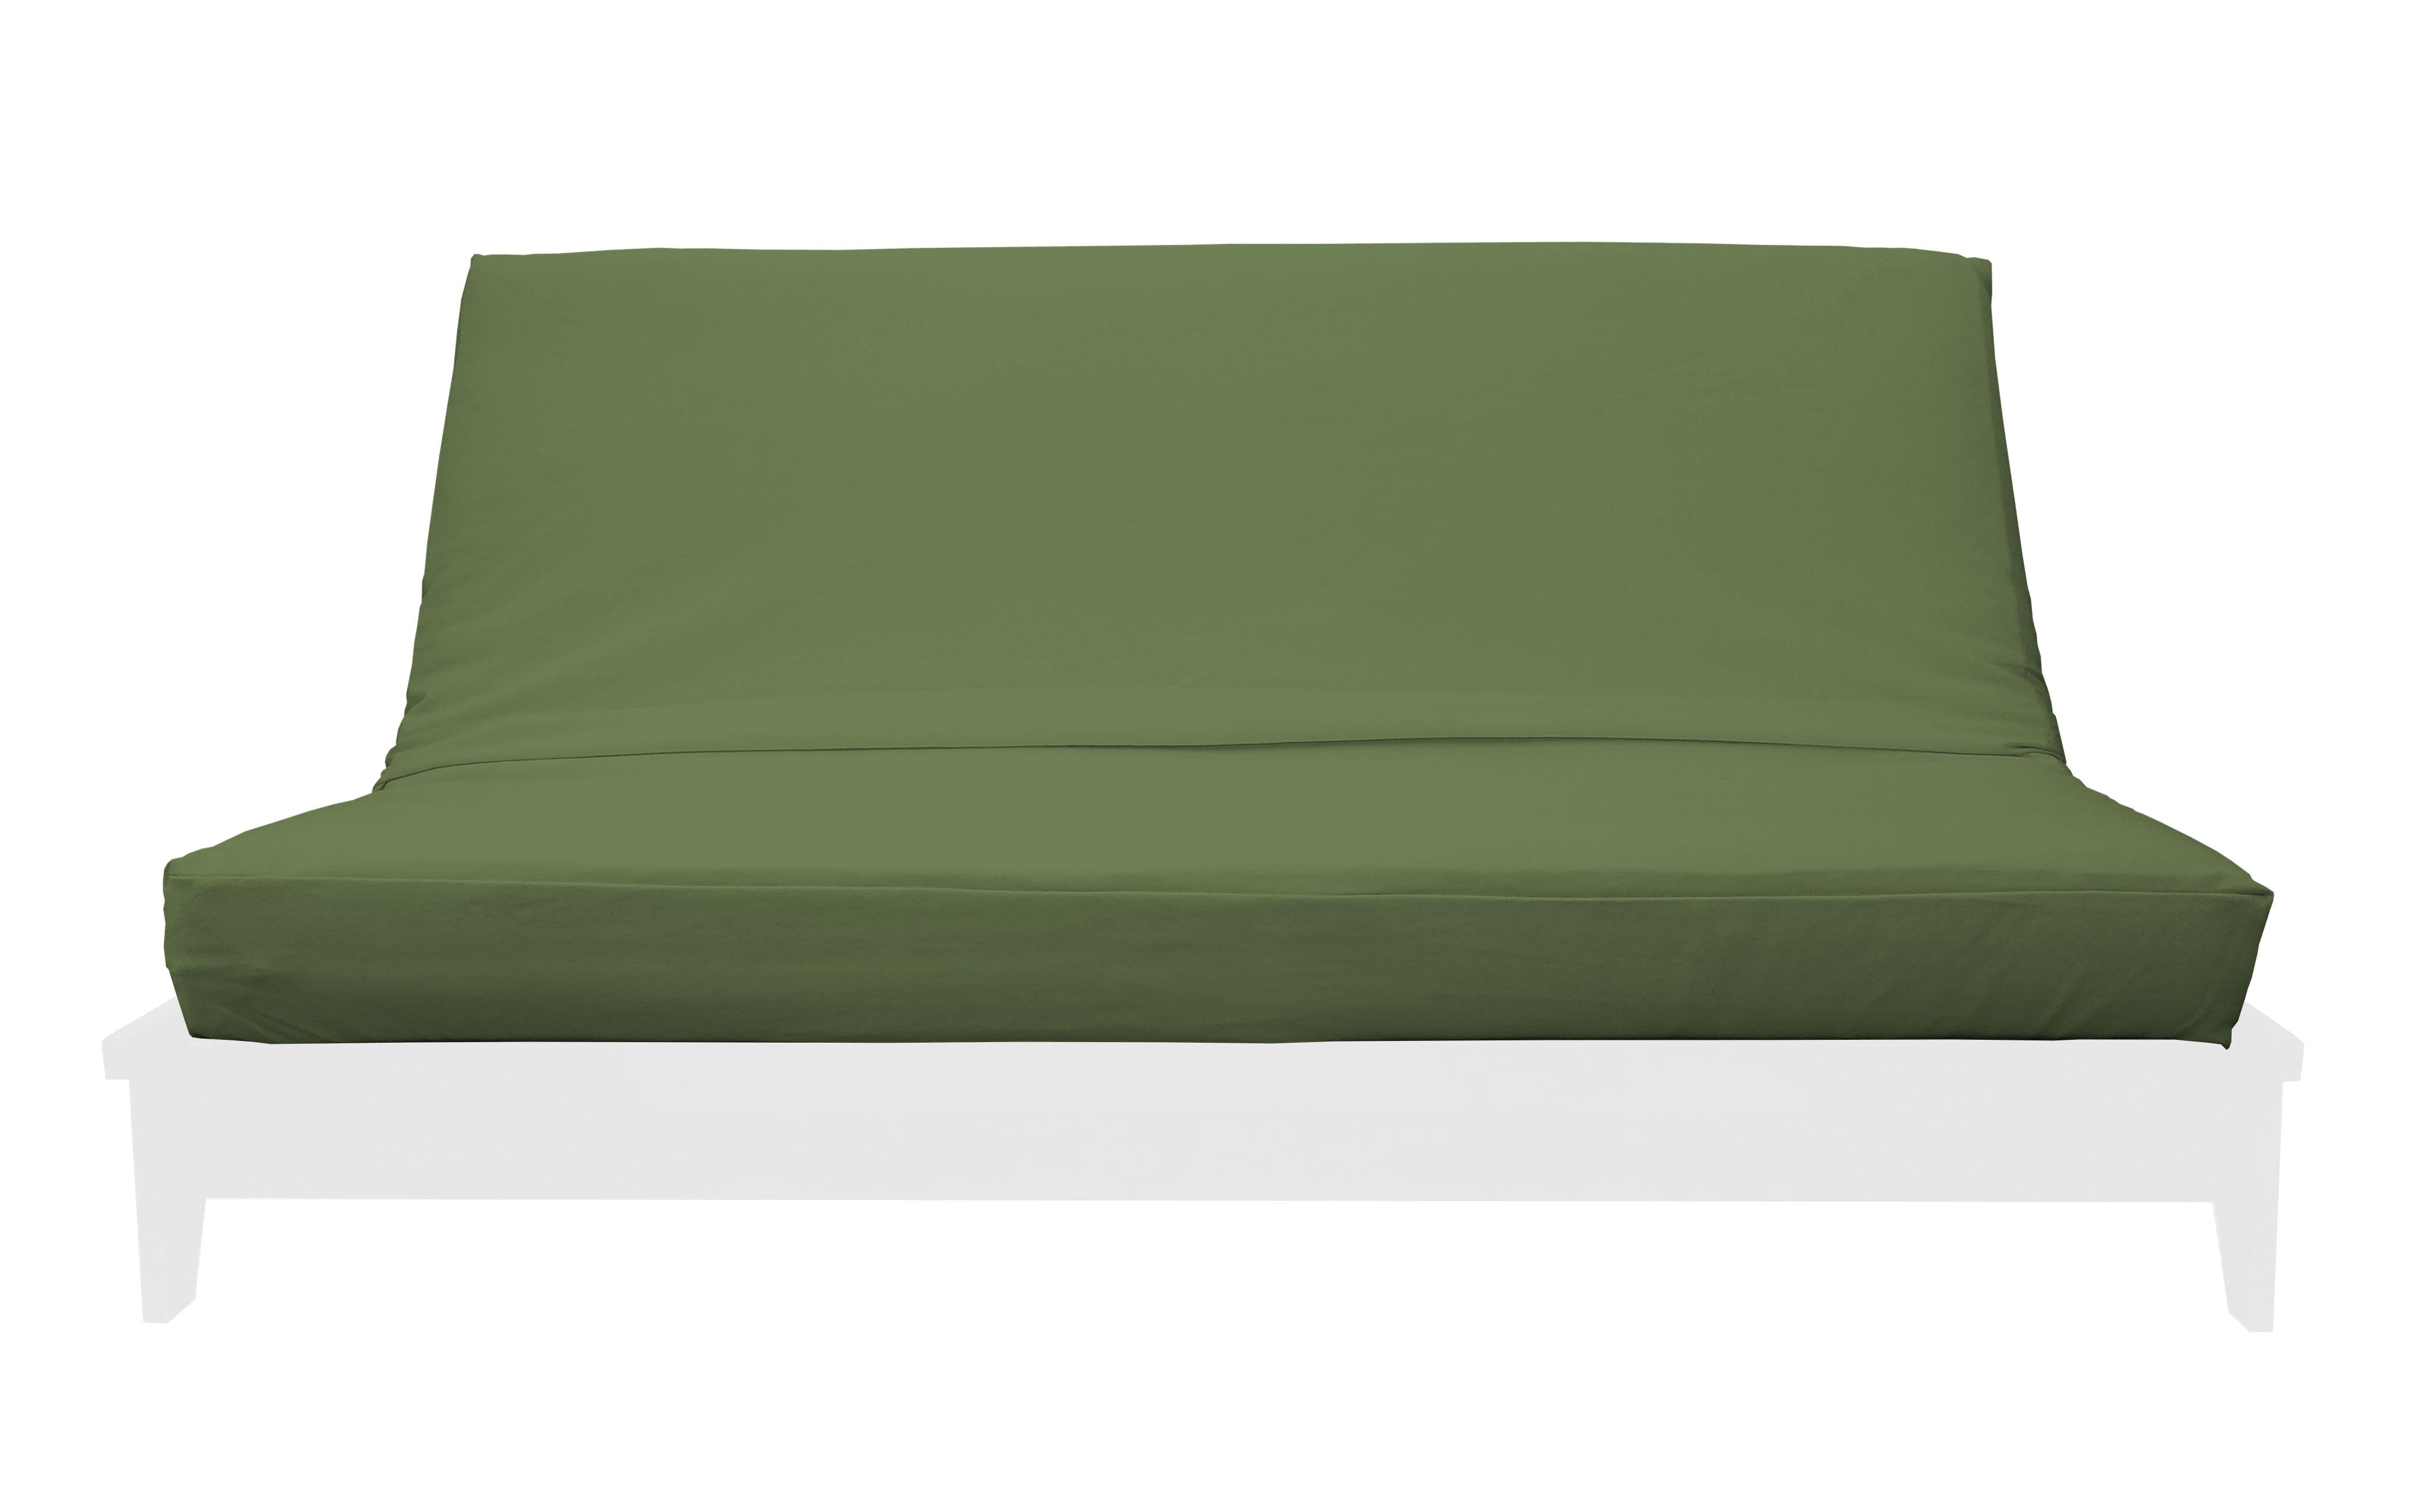 Premium Solid Olive Green Futon Cover